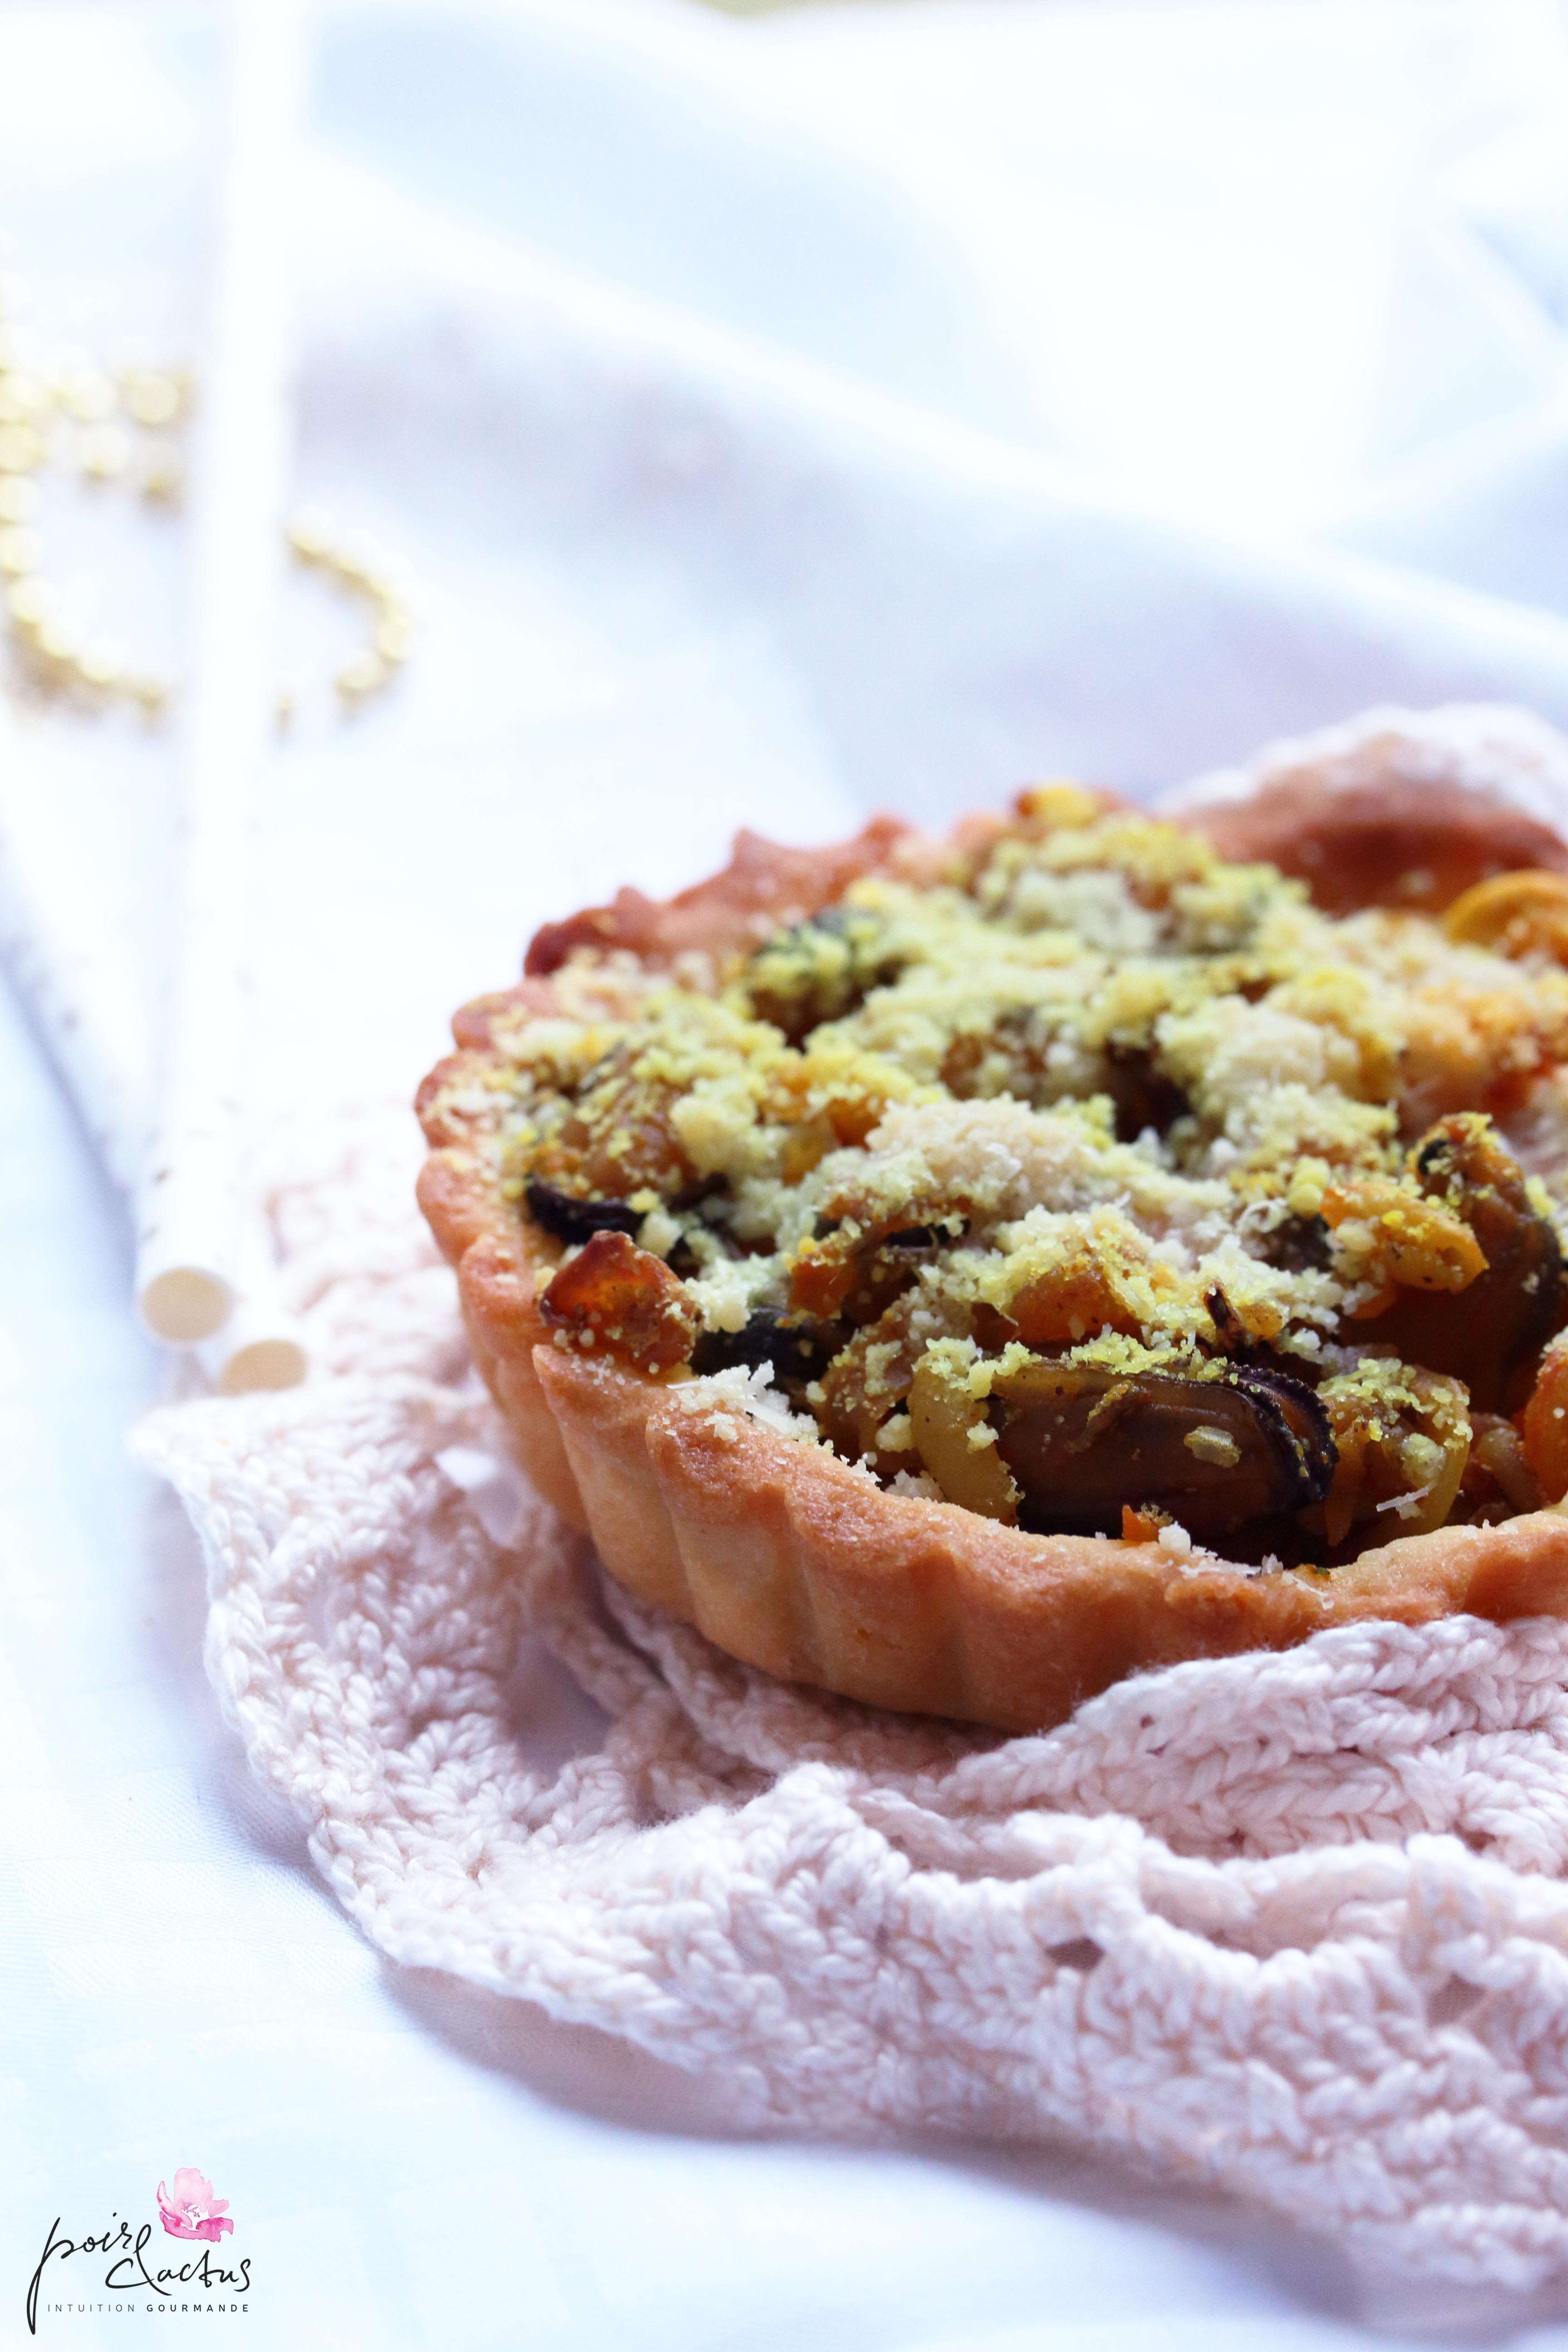 recette_tartelette_fruits_de_mer_poiretcactus_1